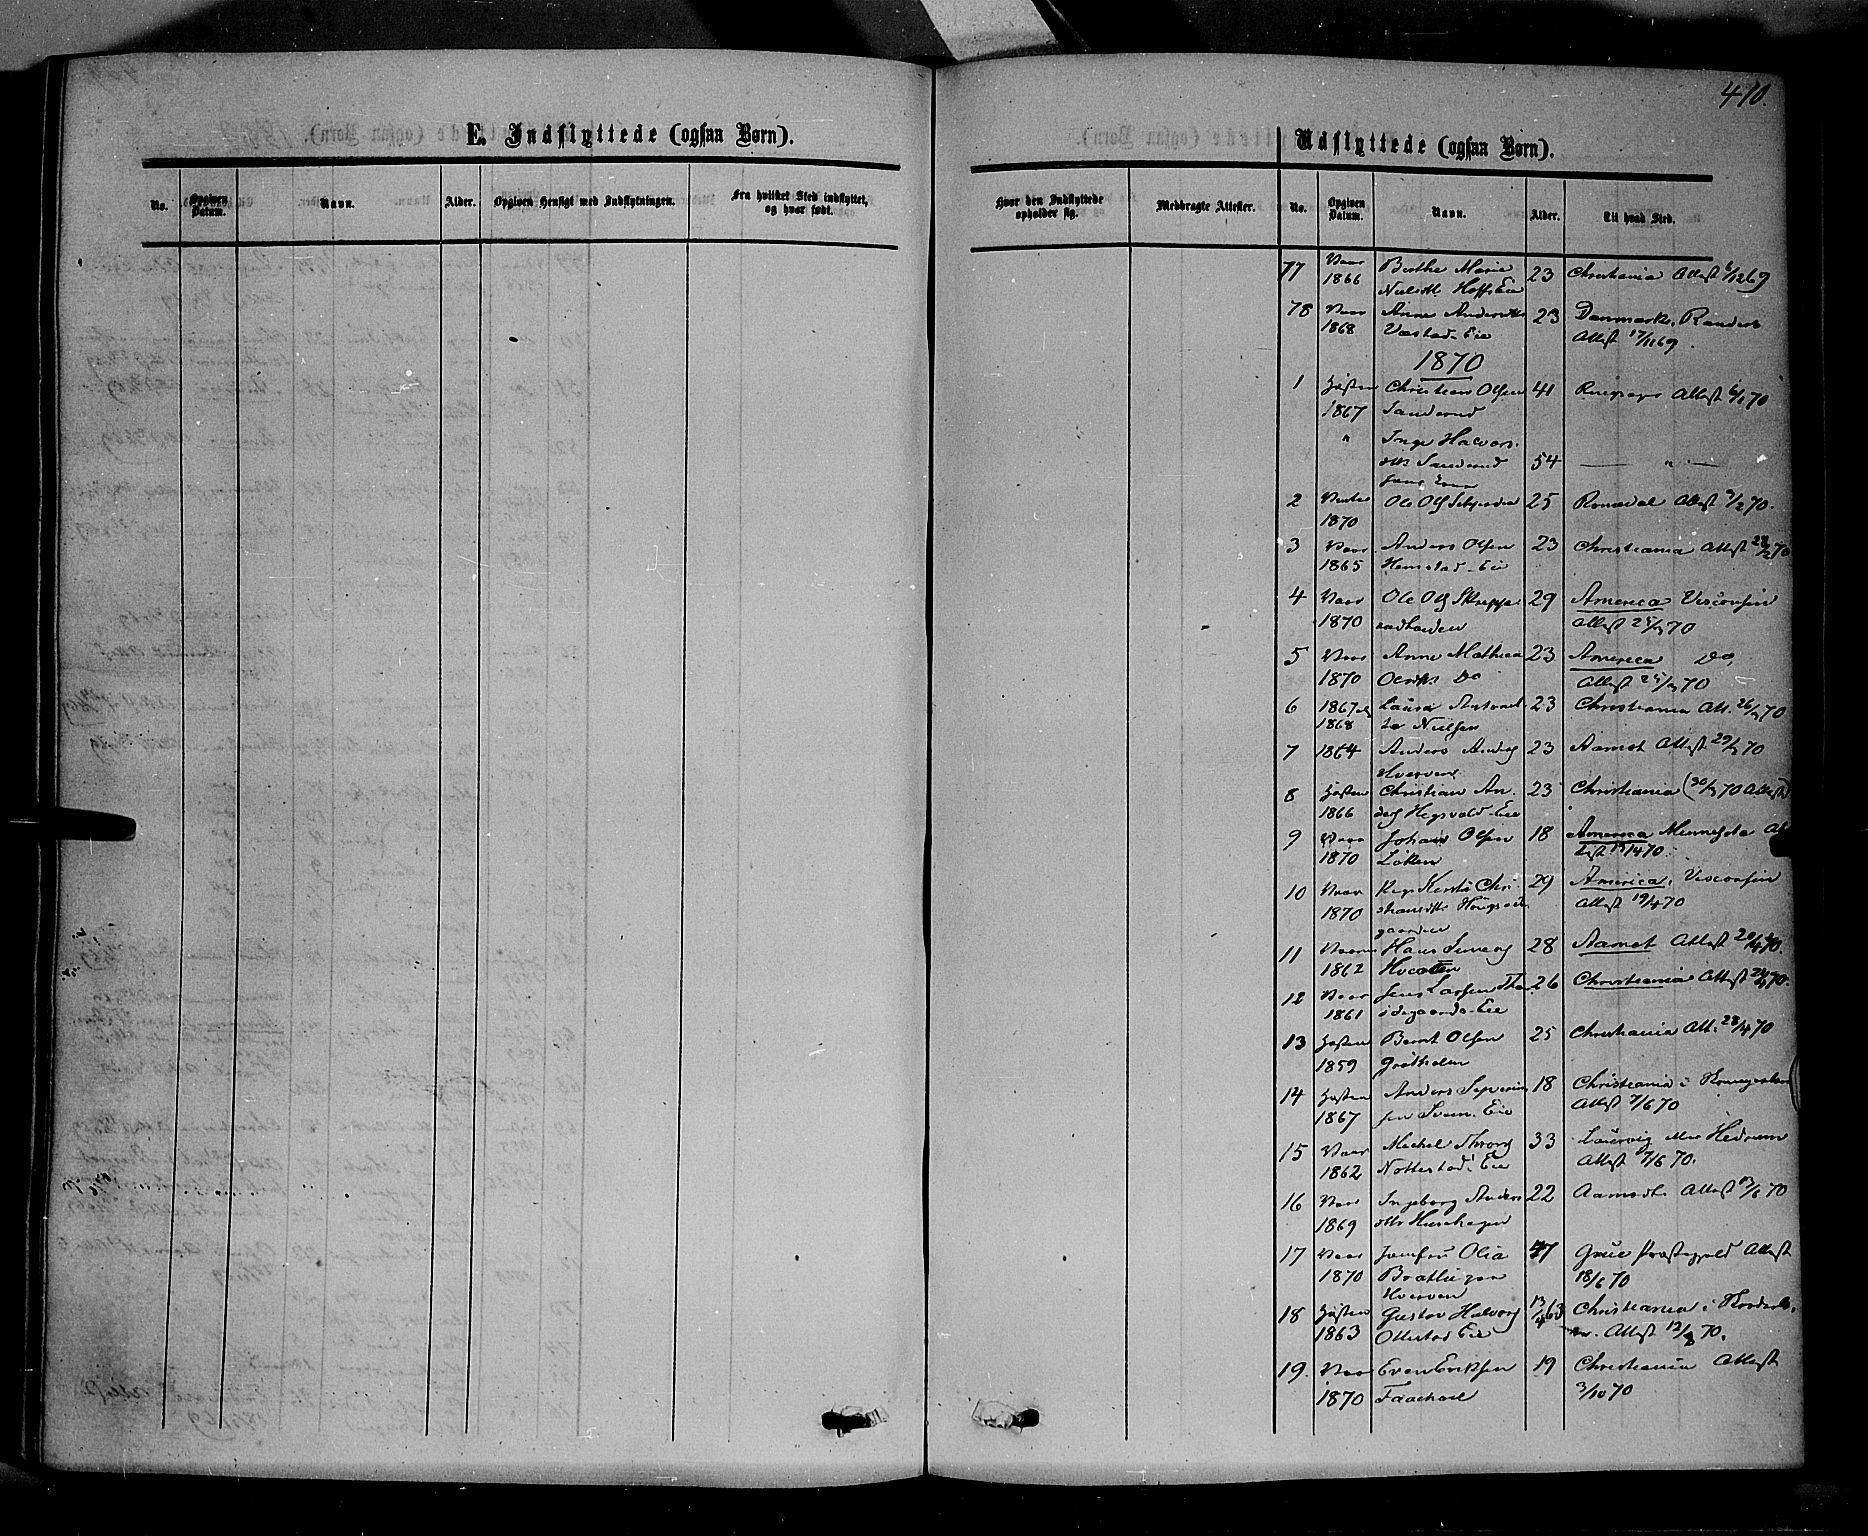 SAH, Stange prestekontor, K/L0013: Ministerialbok nr. 13, 1862-1879, s. 410